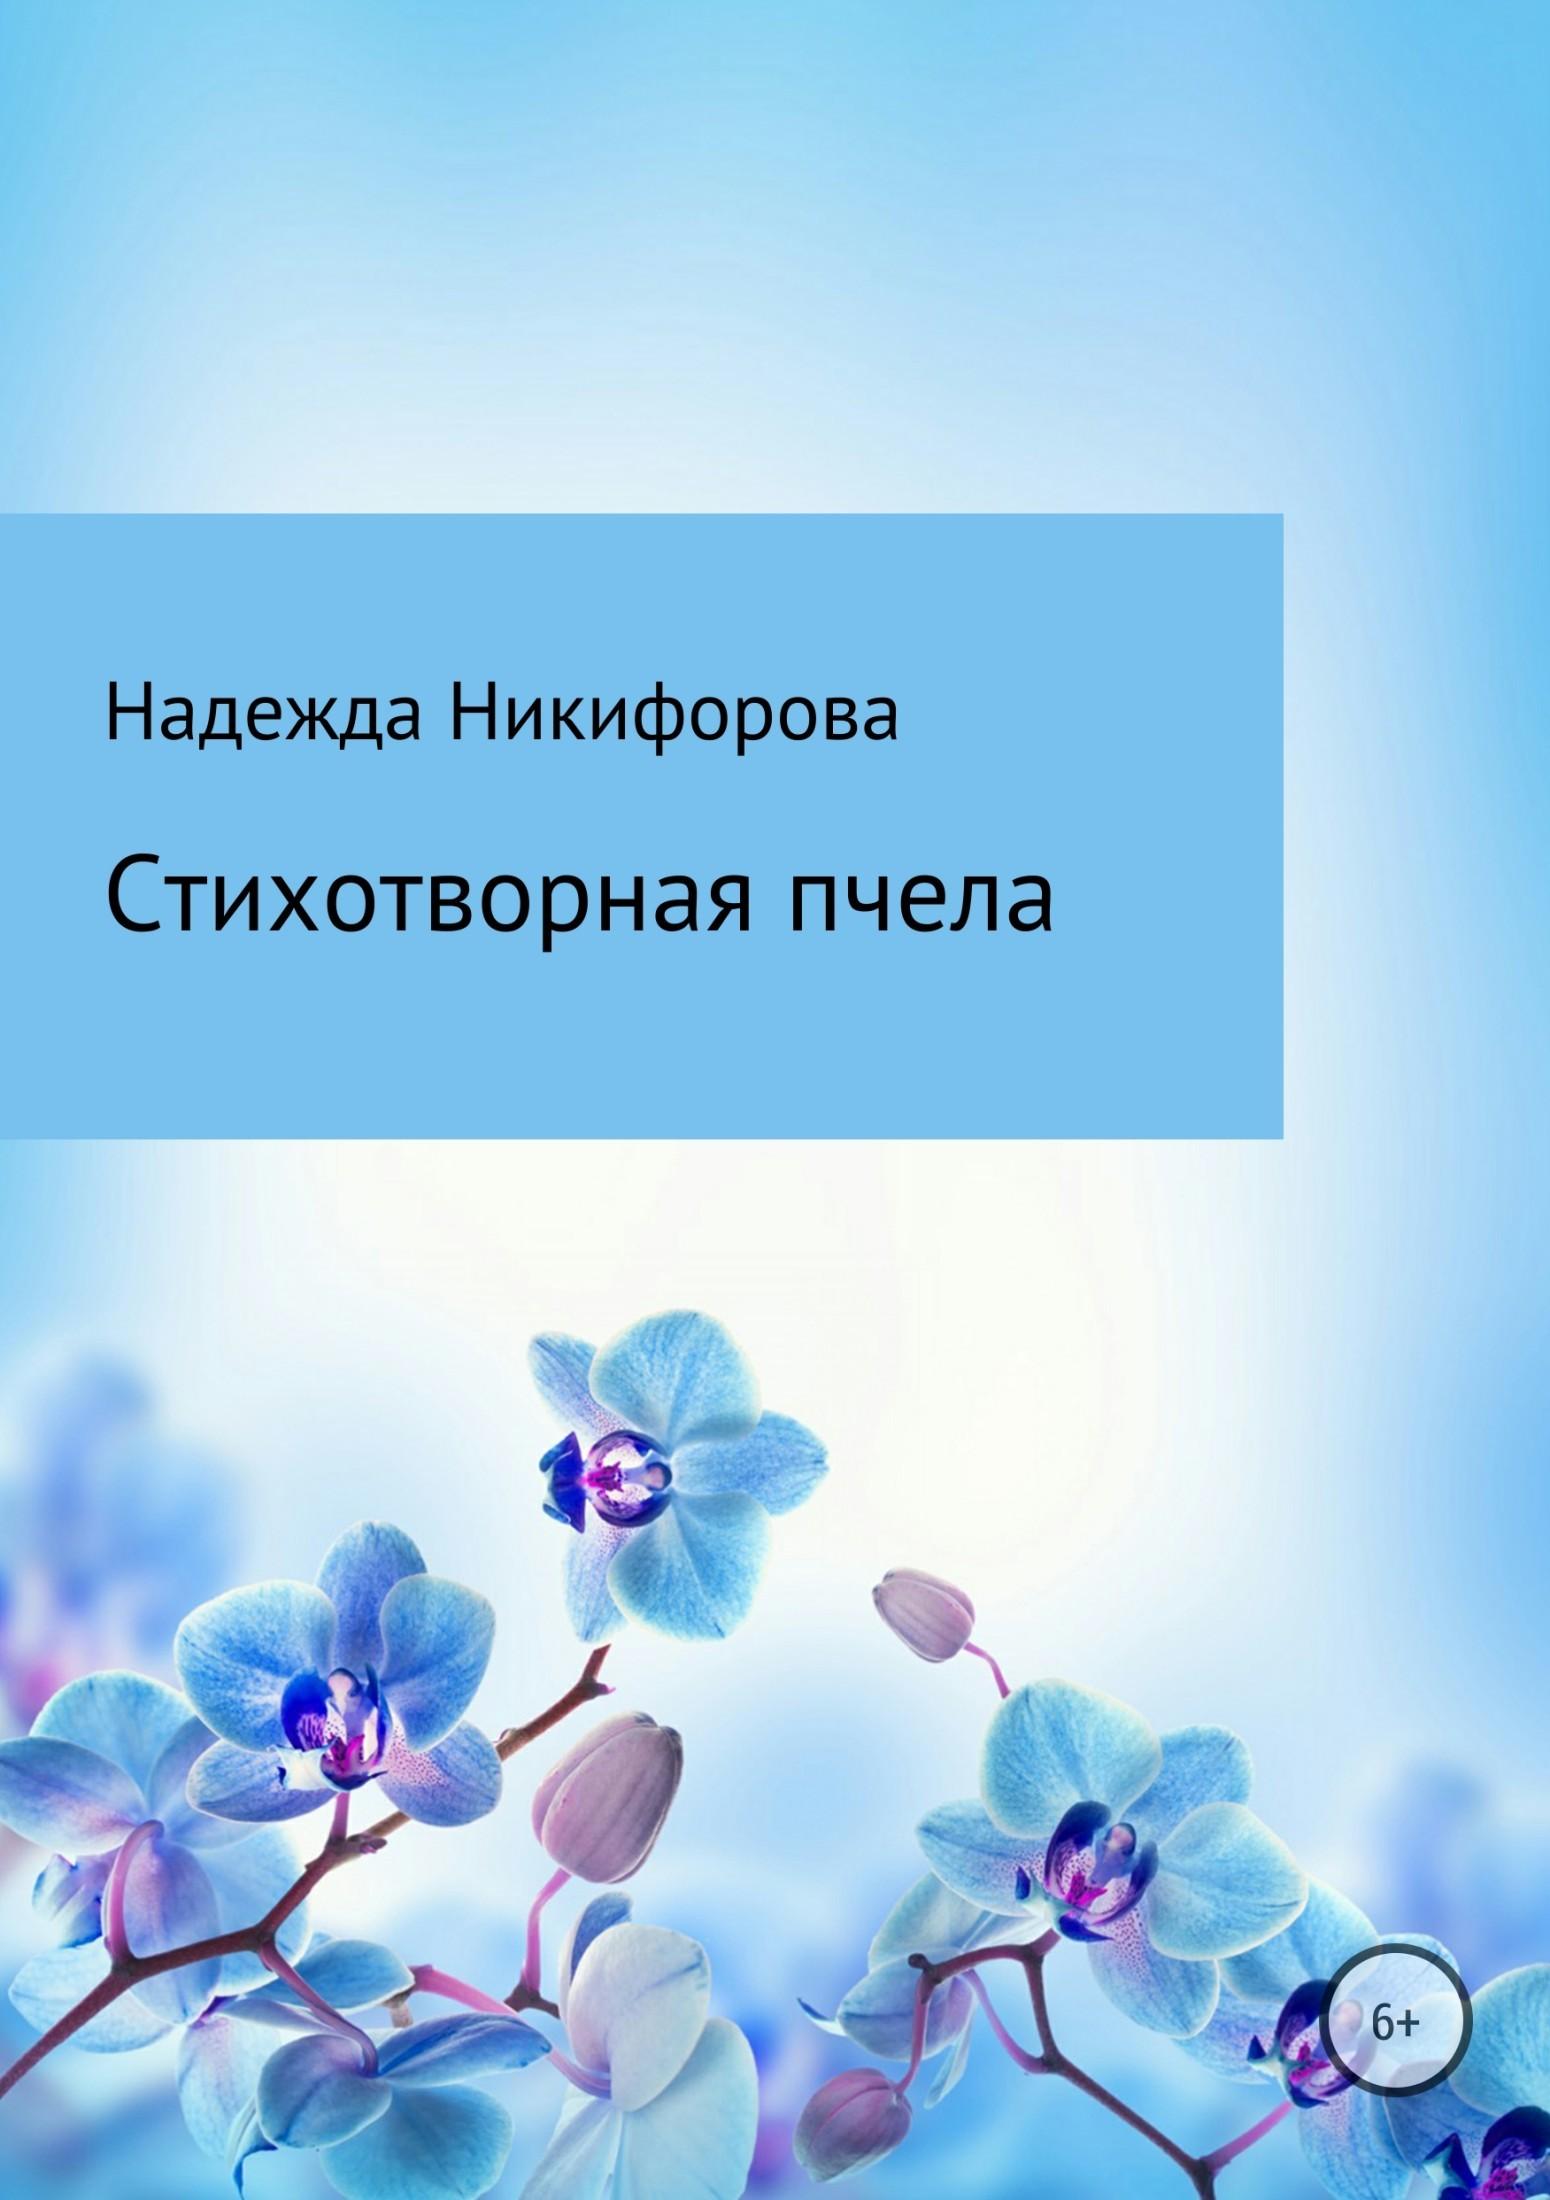 Надежда Петровна Никифорова бесплатно